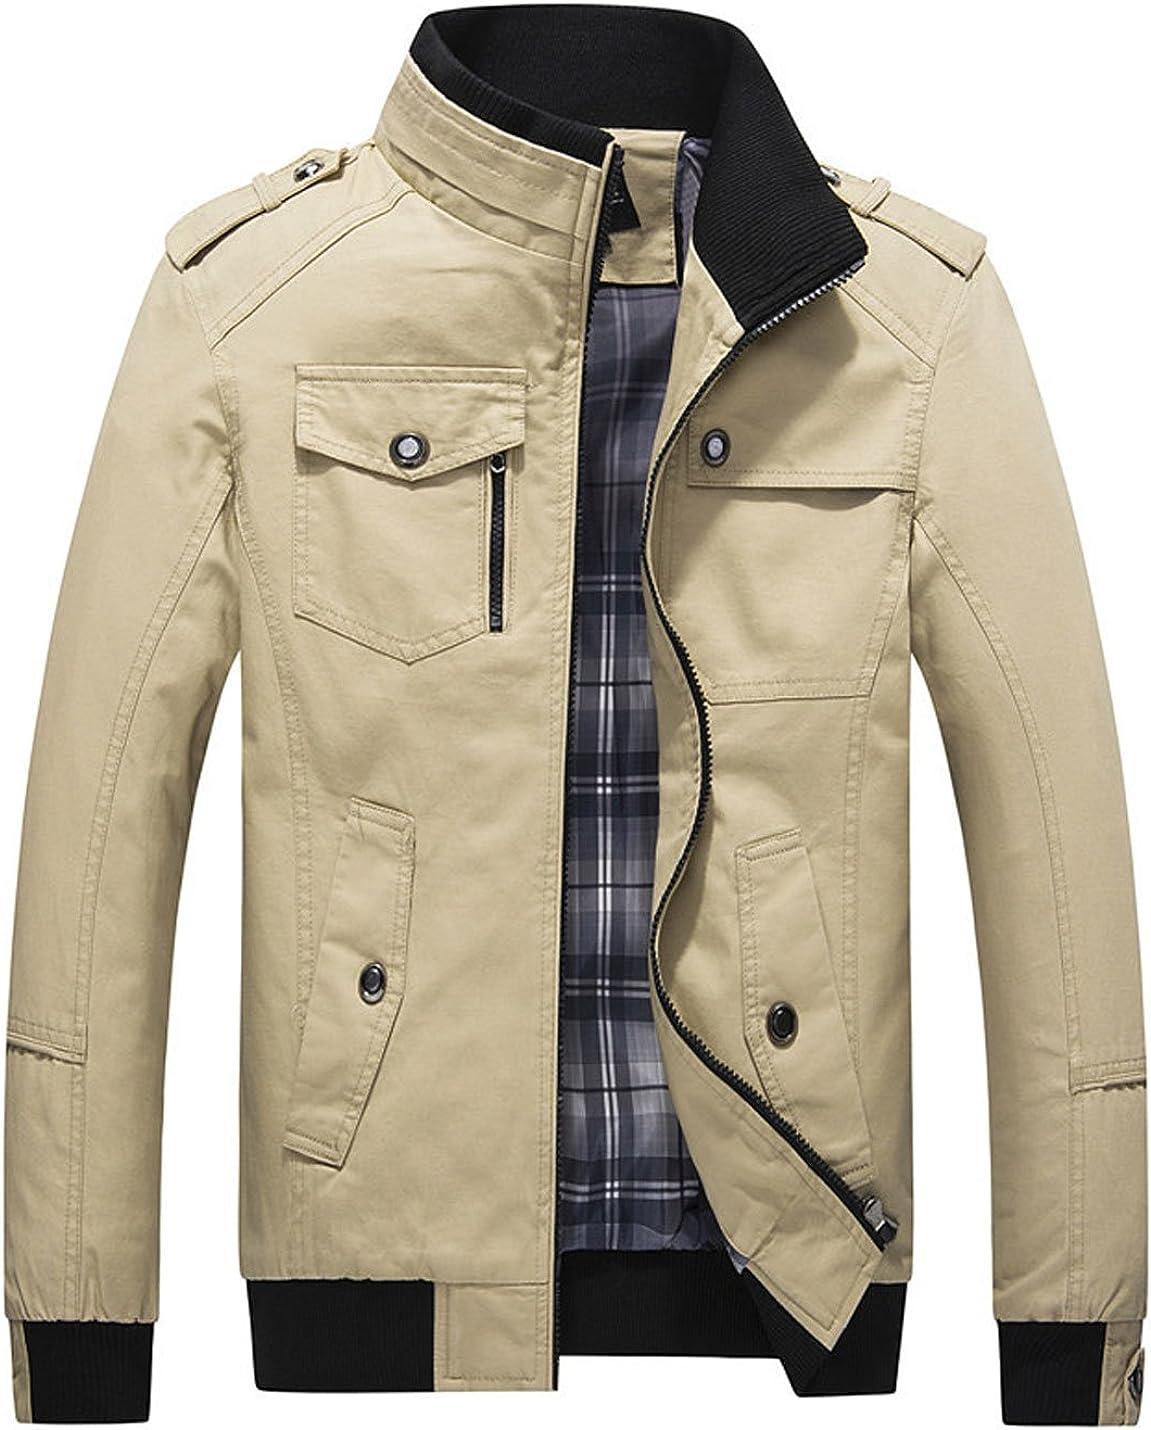 Yeokou Men's New Free Shipping Casual latest Slim Lightweight Stand Collar Zipper Cotton